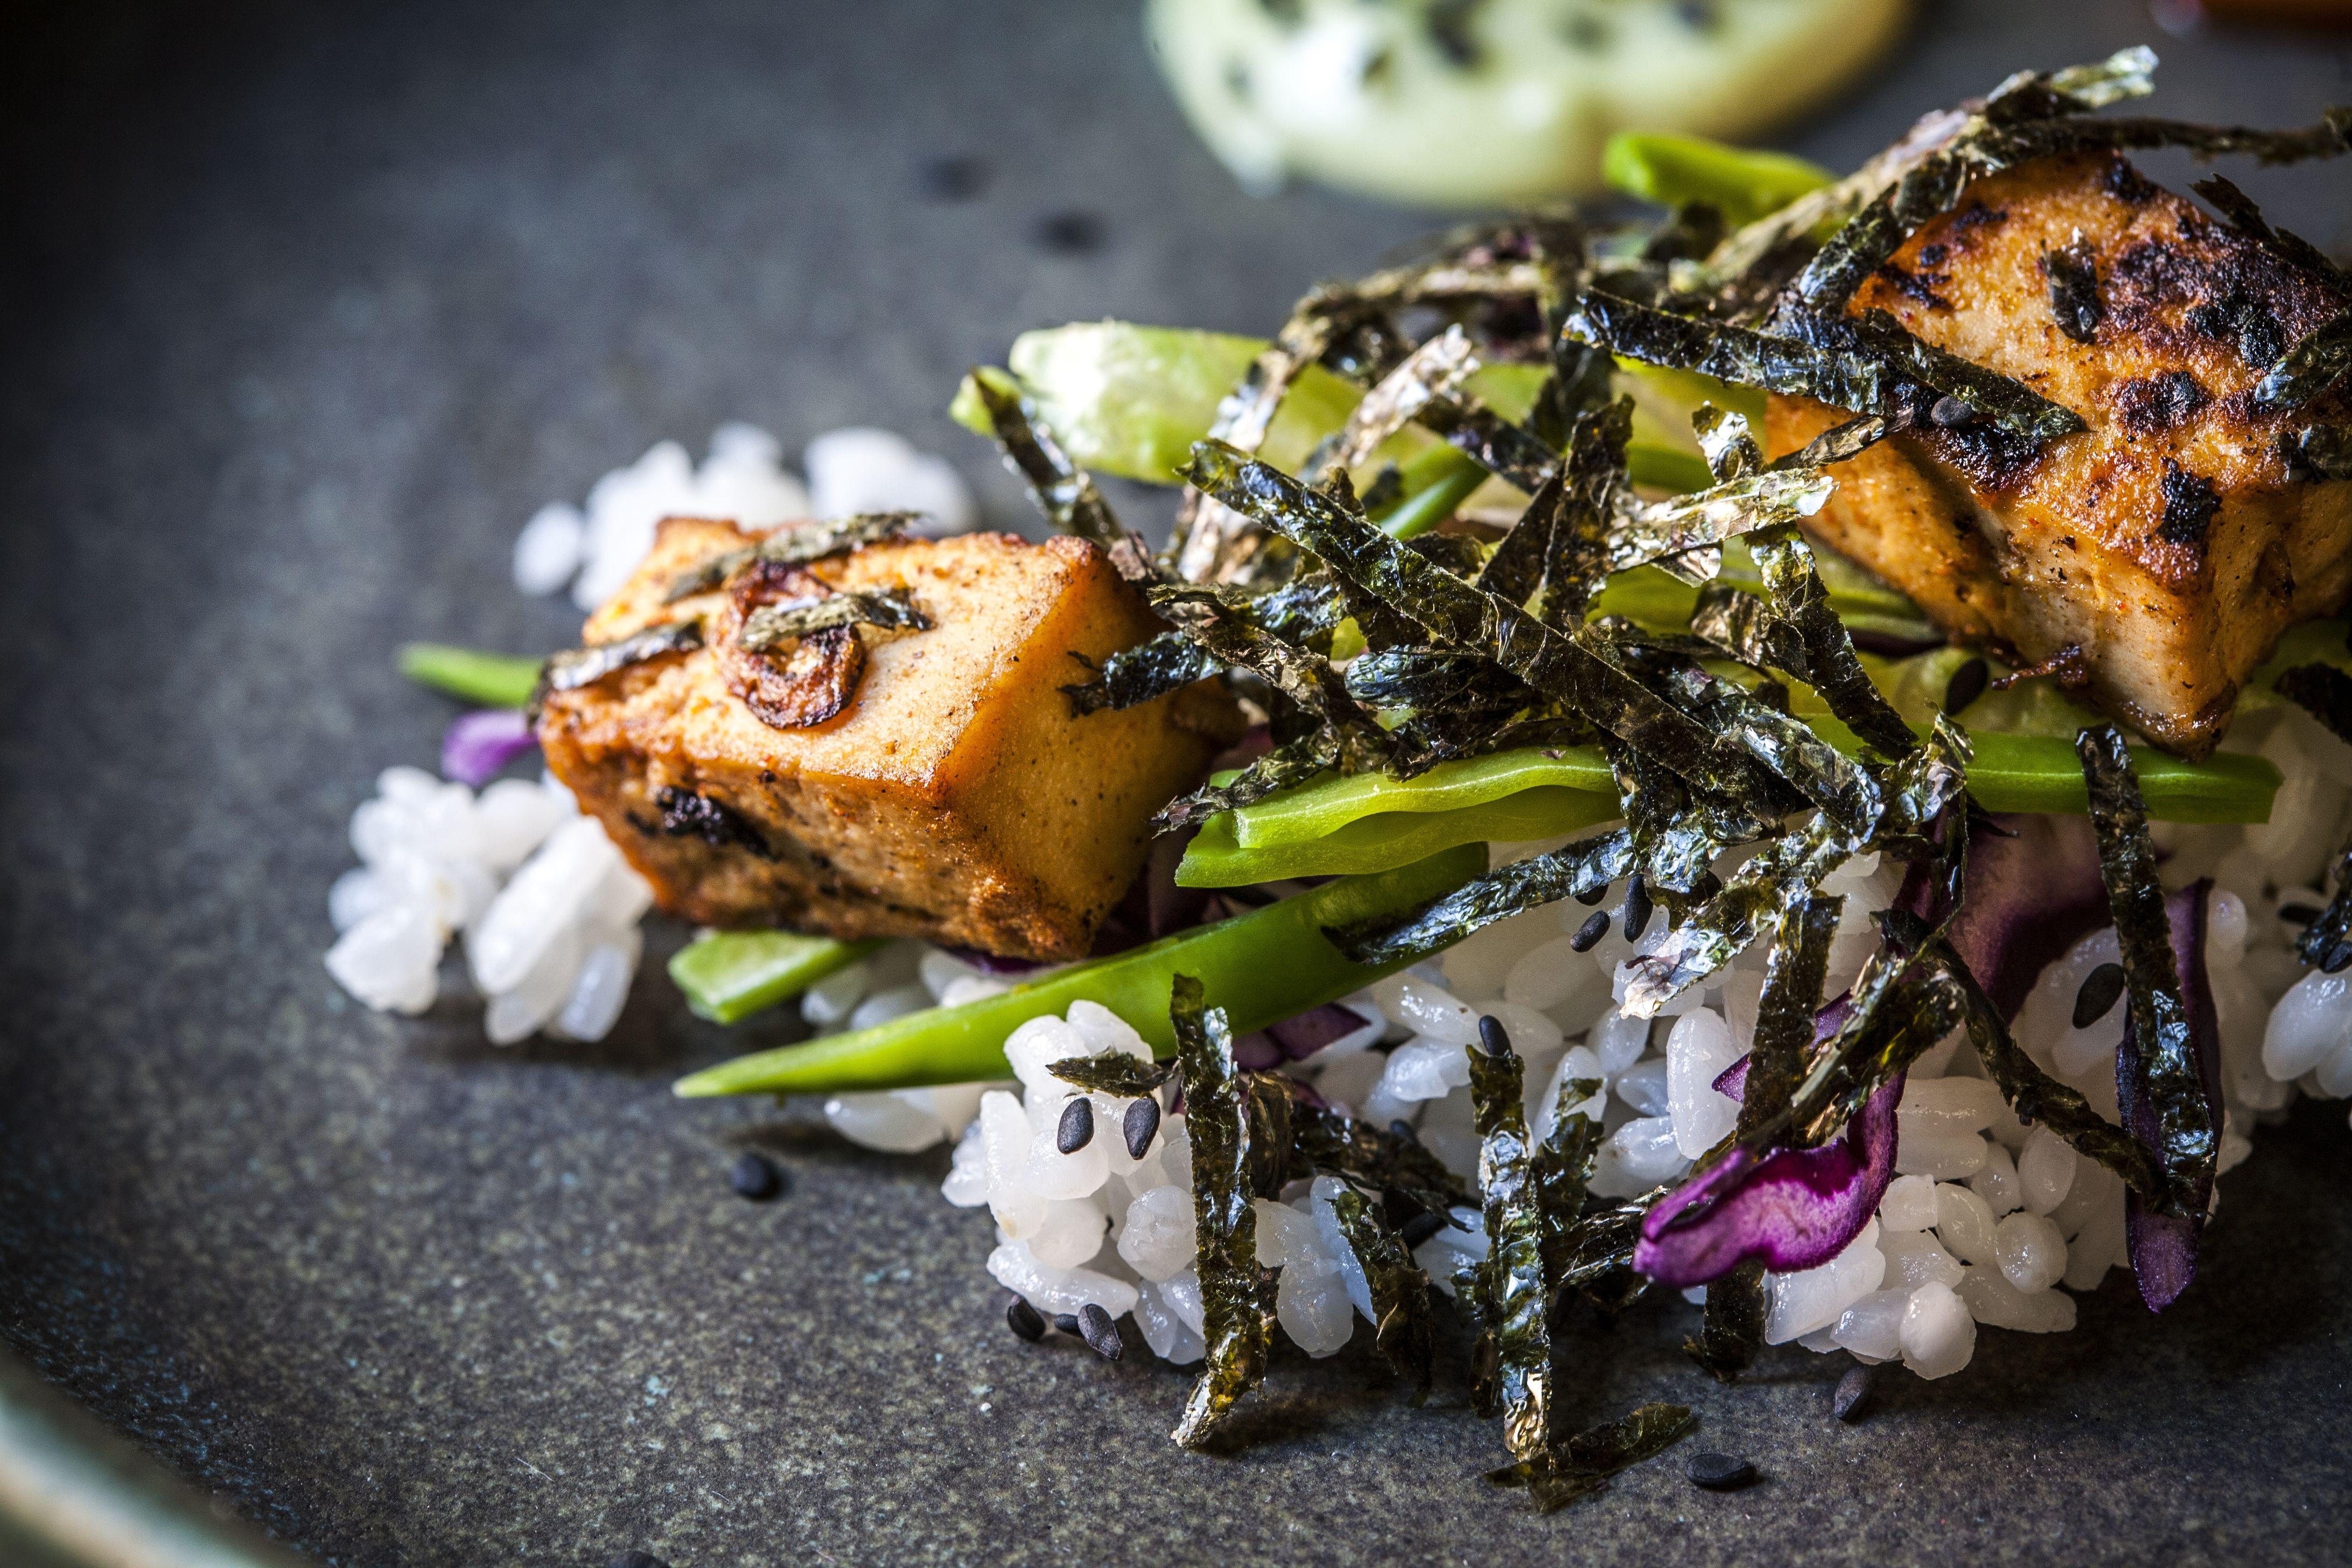 settings Smoked Tofu, Nori and Sushi Rice Salad